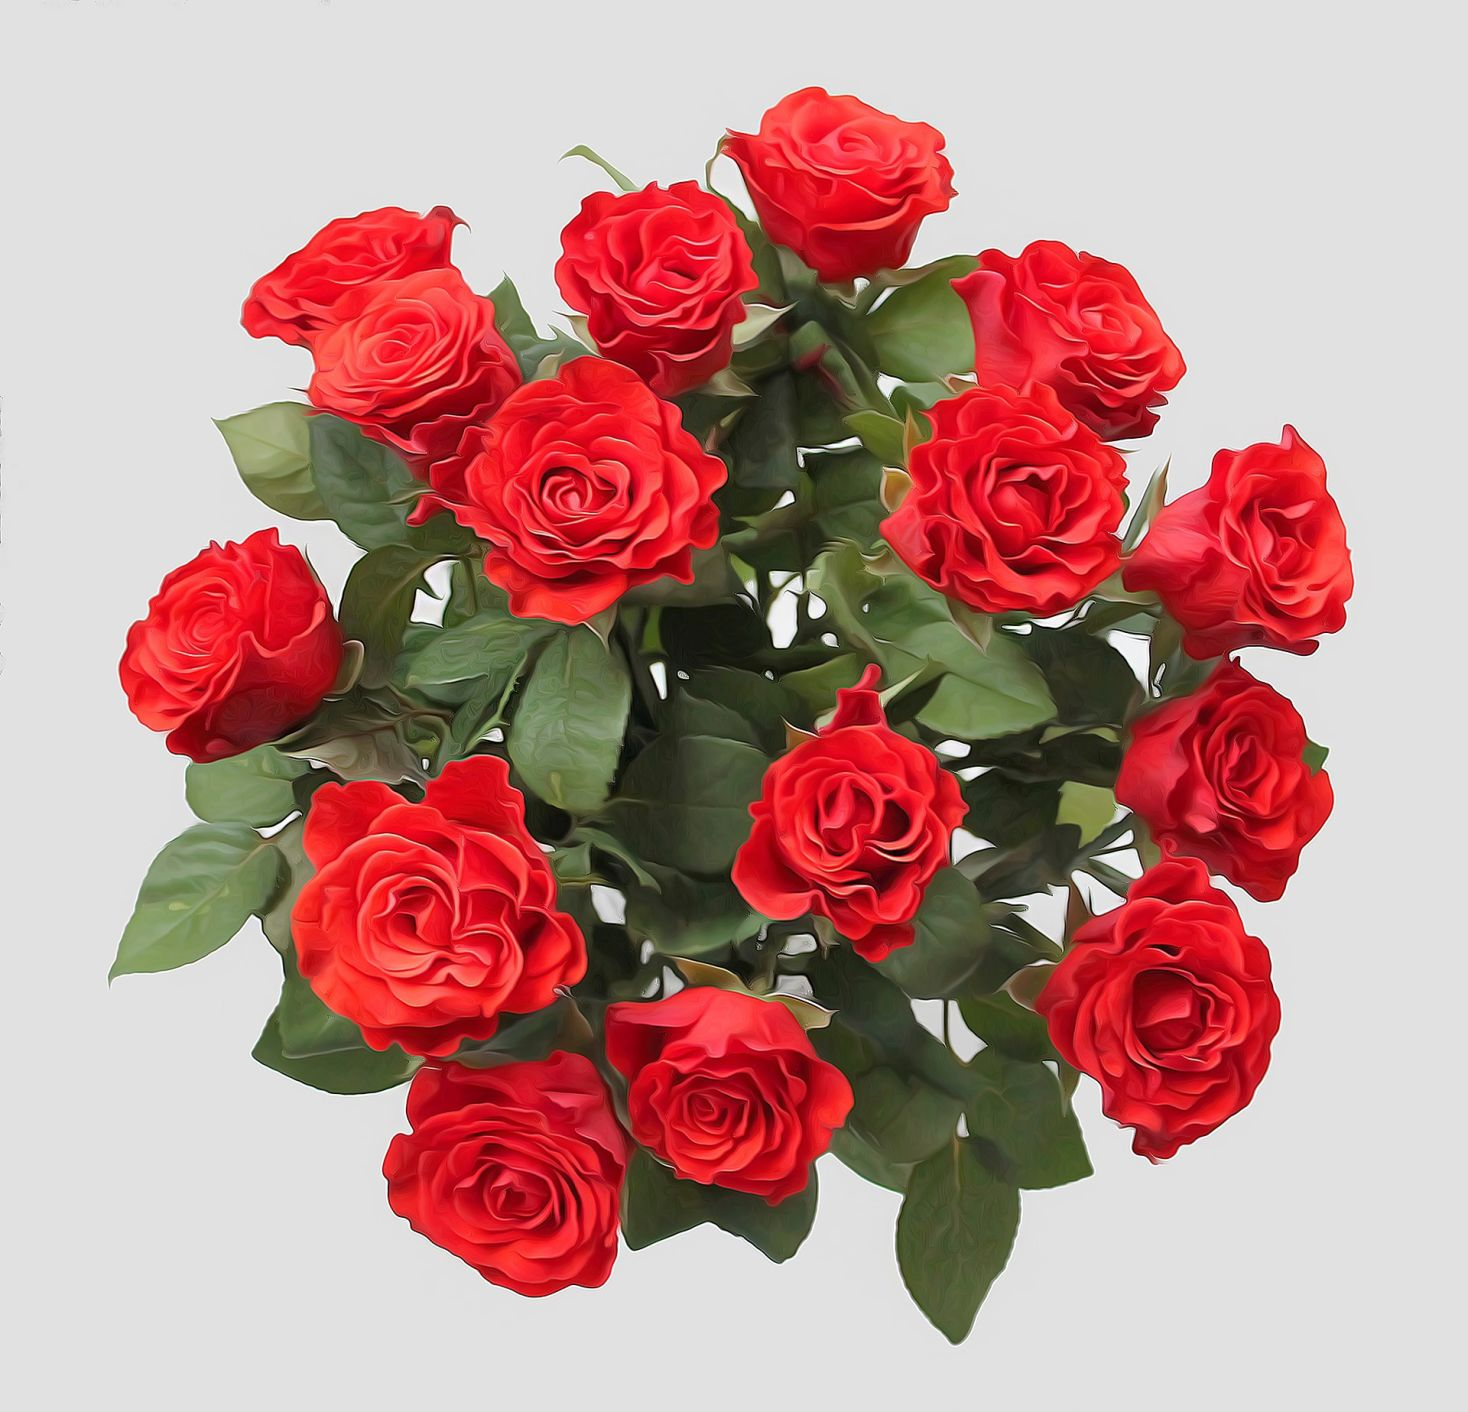 RosesBouquet-Roses&Thorns-RGB